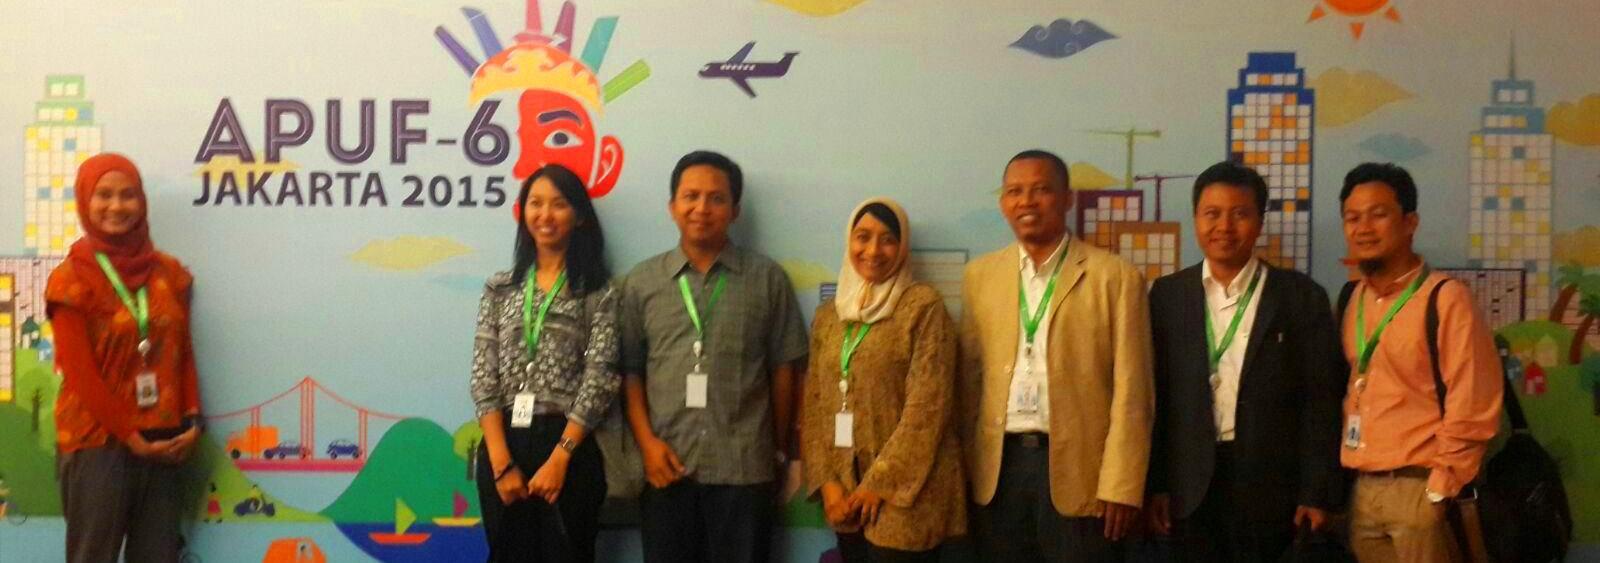 The 6th Asia Pacific Urban Forum (APUF)